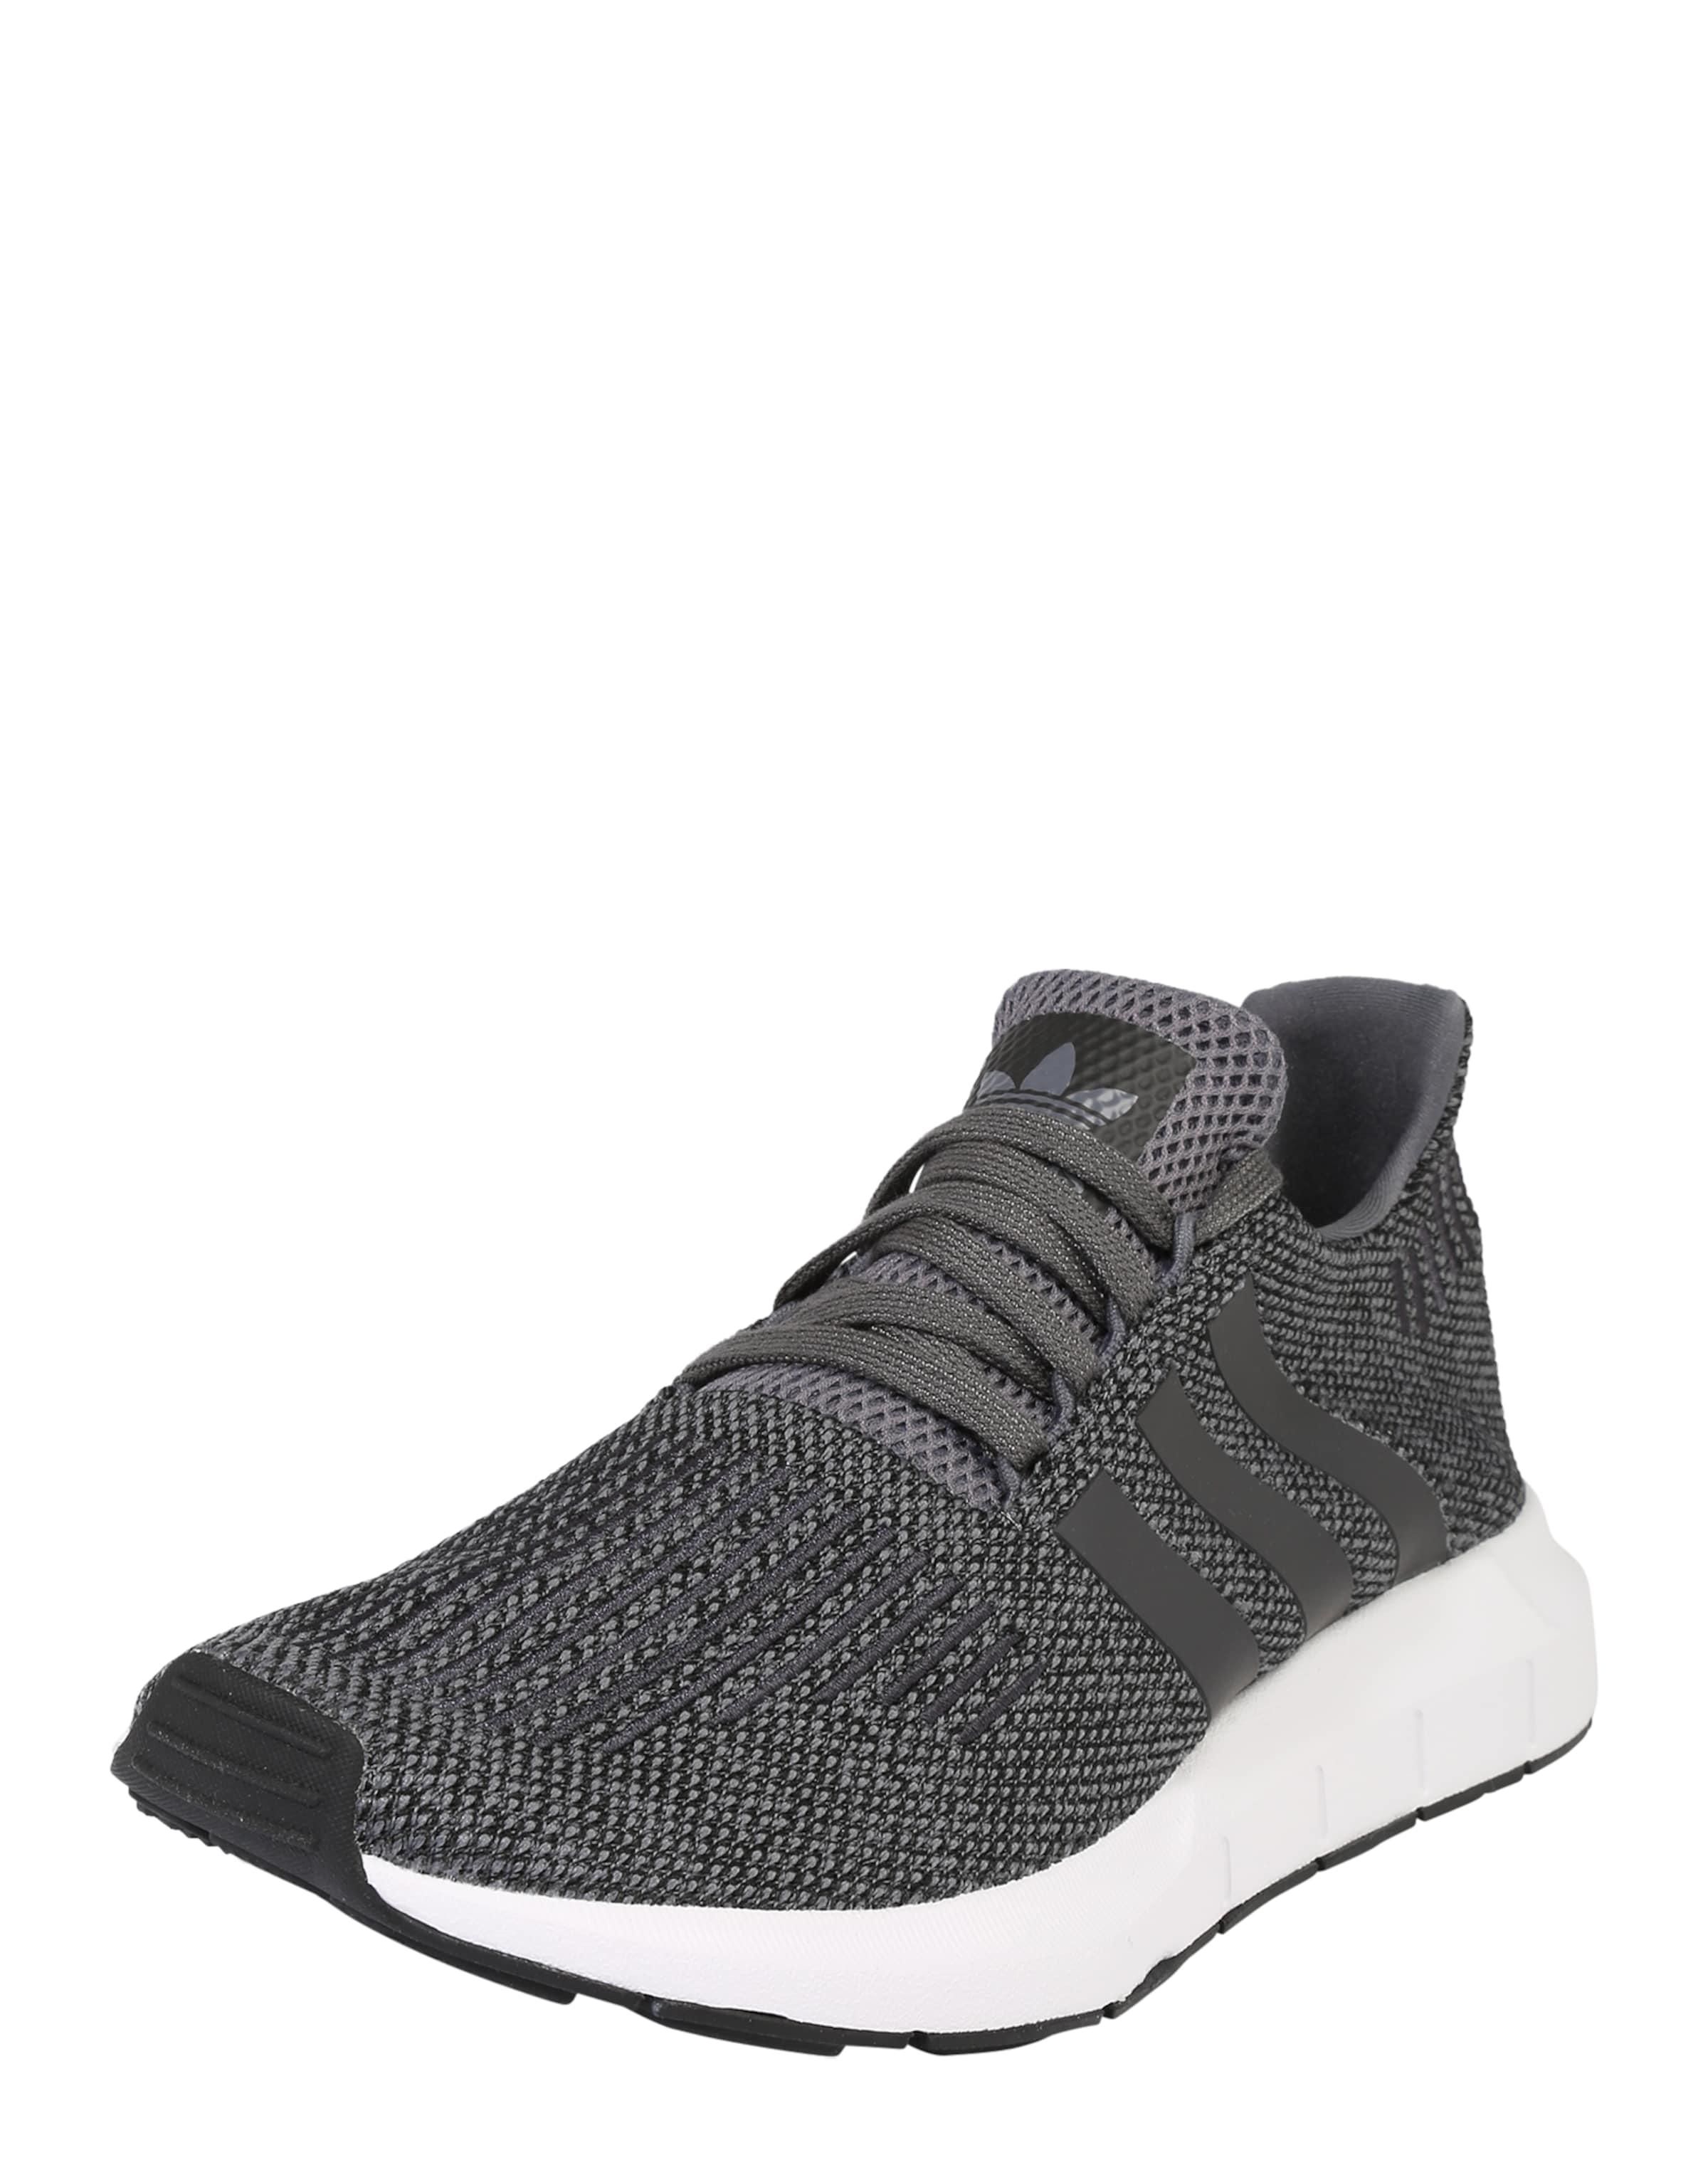 ADIDAS ORIGINALS Sneakers Swift Run Hohe Qualität